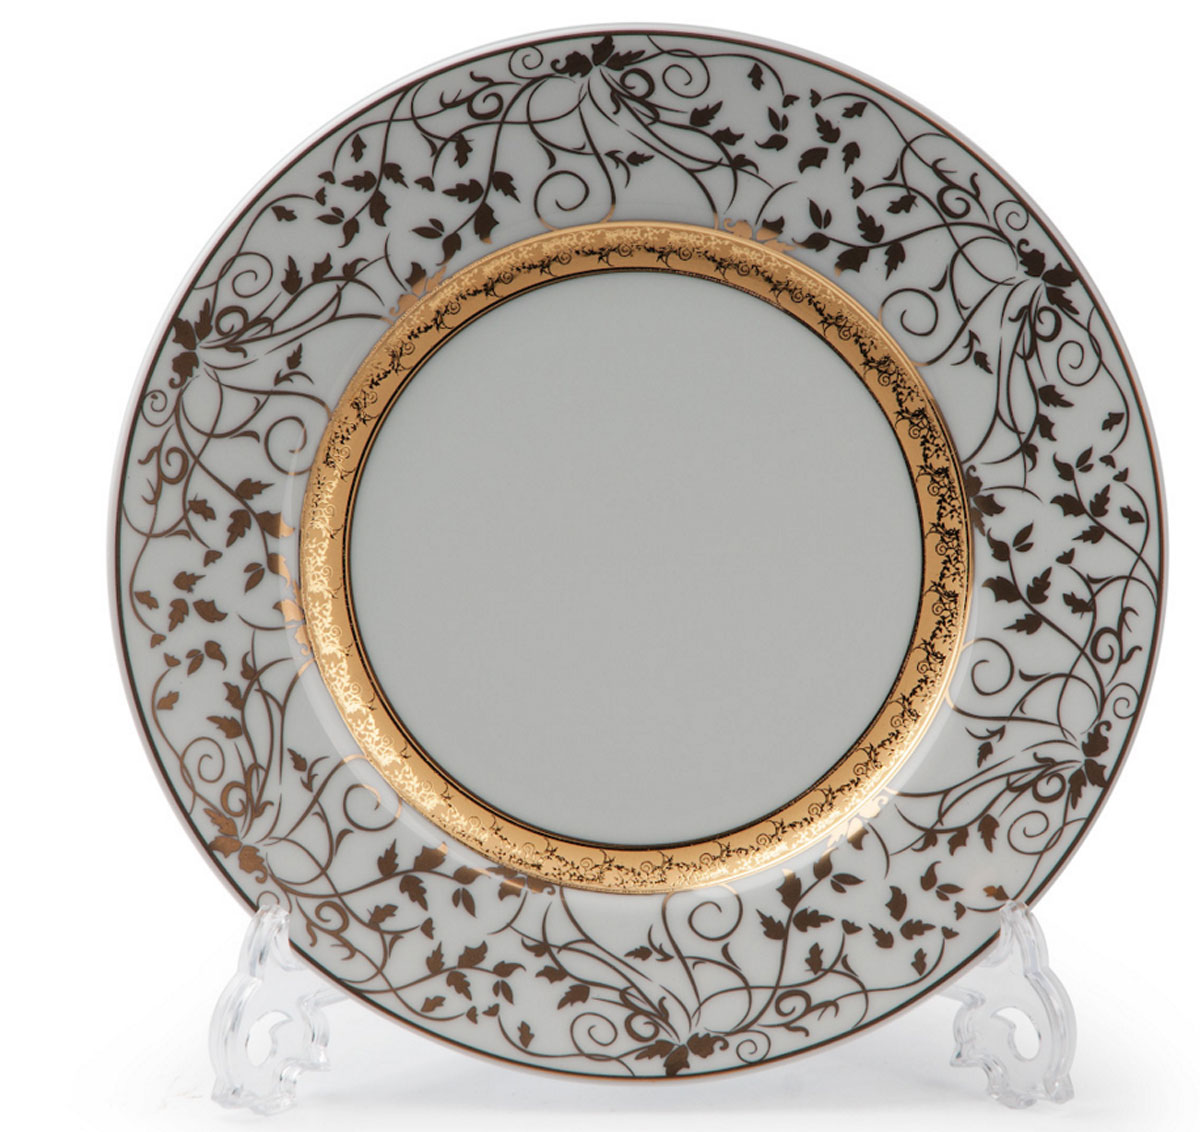 Mimosa Lierre Or 947, набор тарелок 22см (6шт), цвет: белый с золотом539117947В наборе тарелка 22 см 6 штук Материал: фарфор: цвет: белый с золотомСерия: MIMOSA